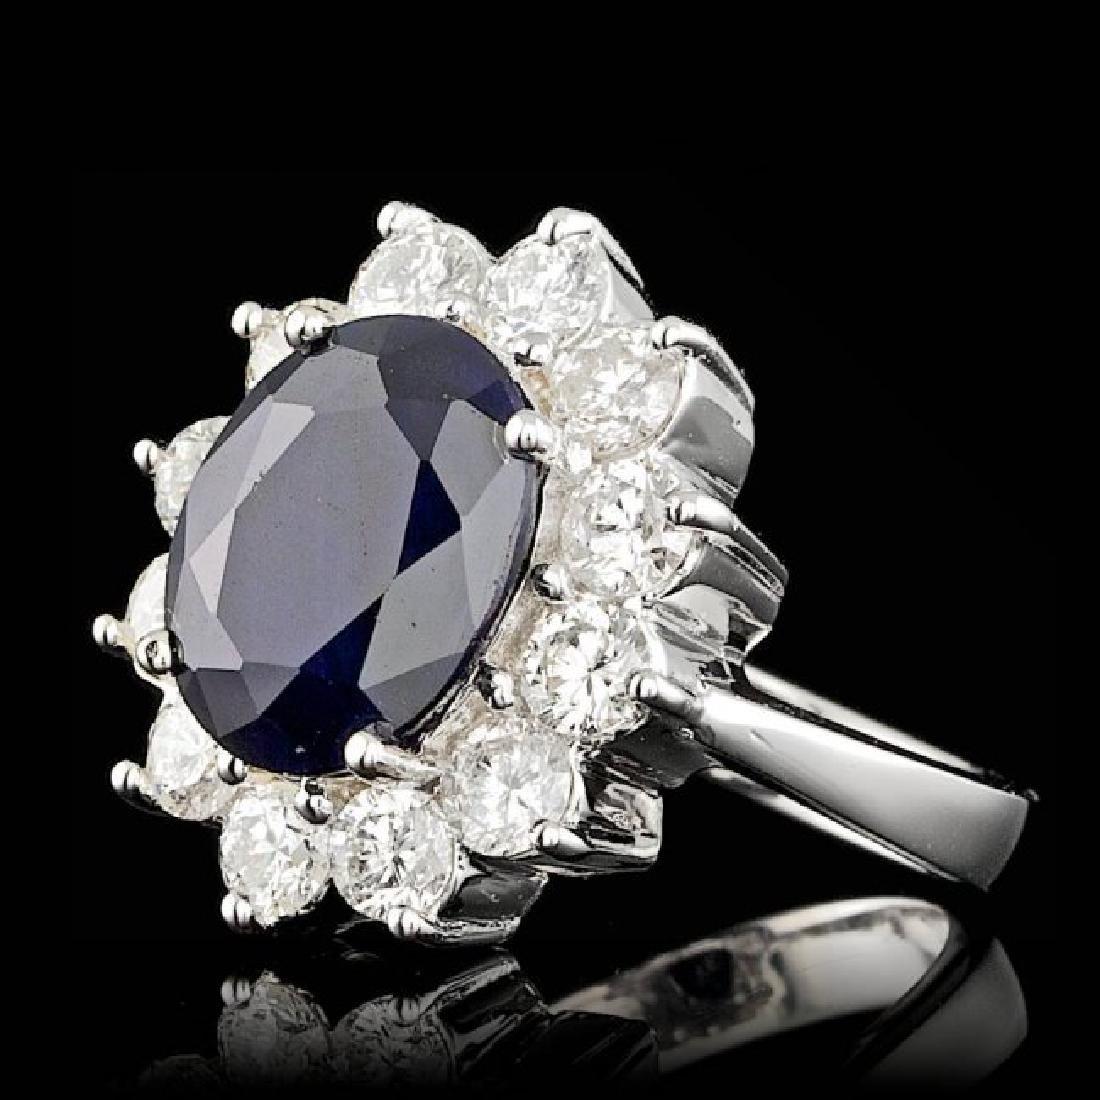 14k Gold 5.00ct Sapphire 2.50ct Diamond Ring - 2